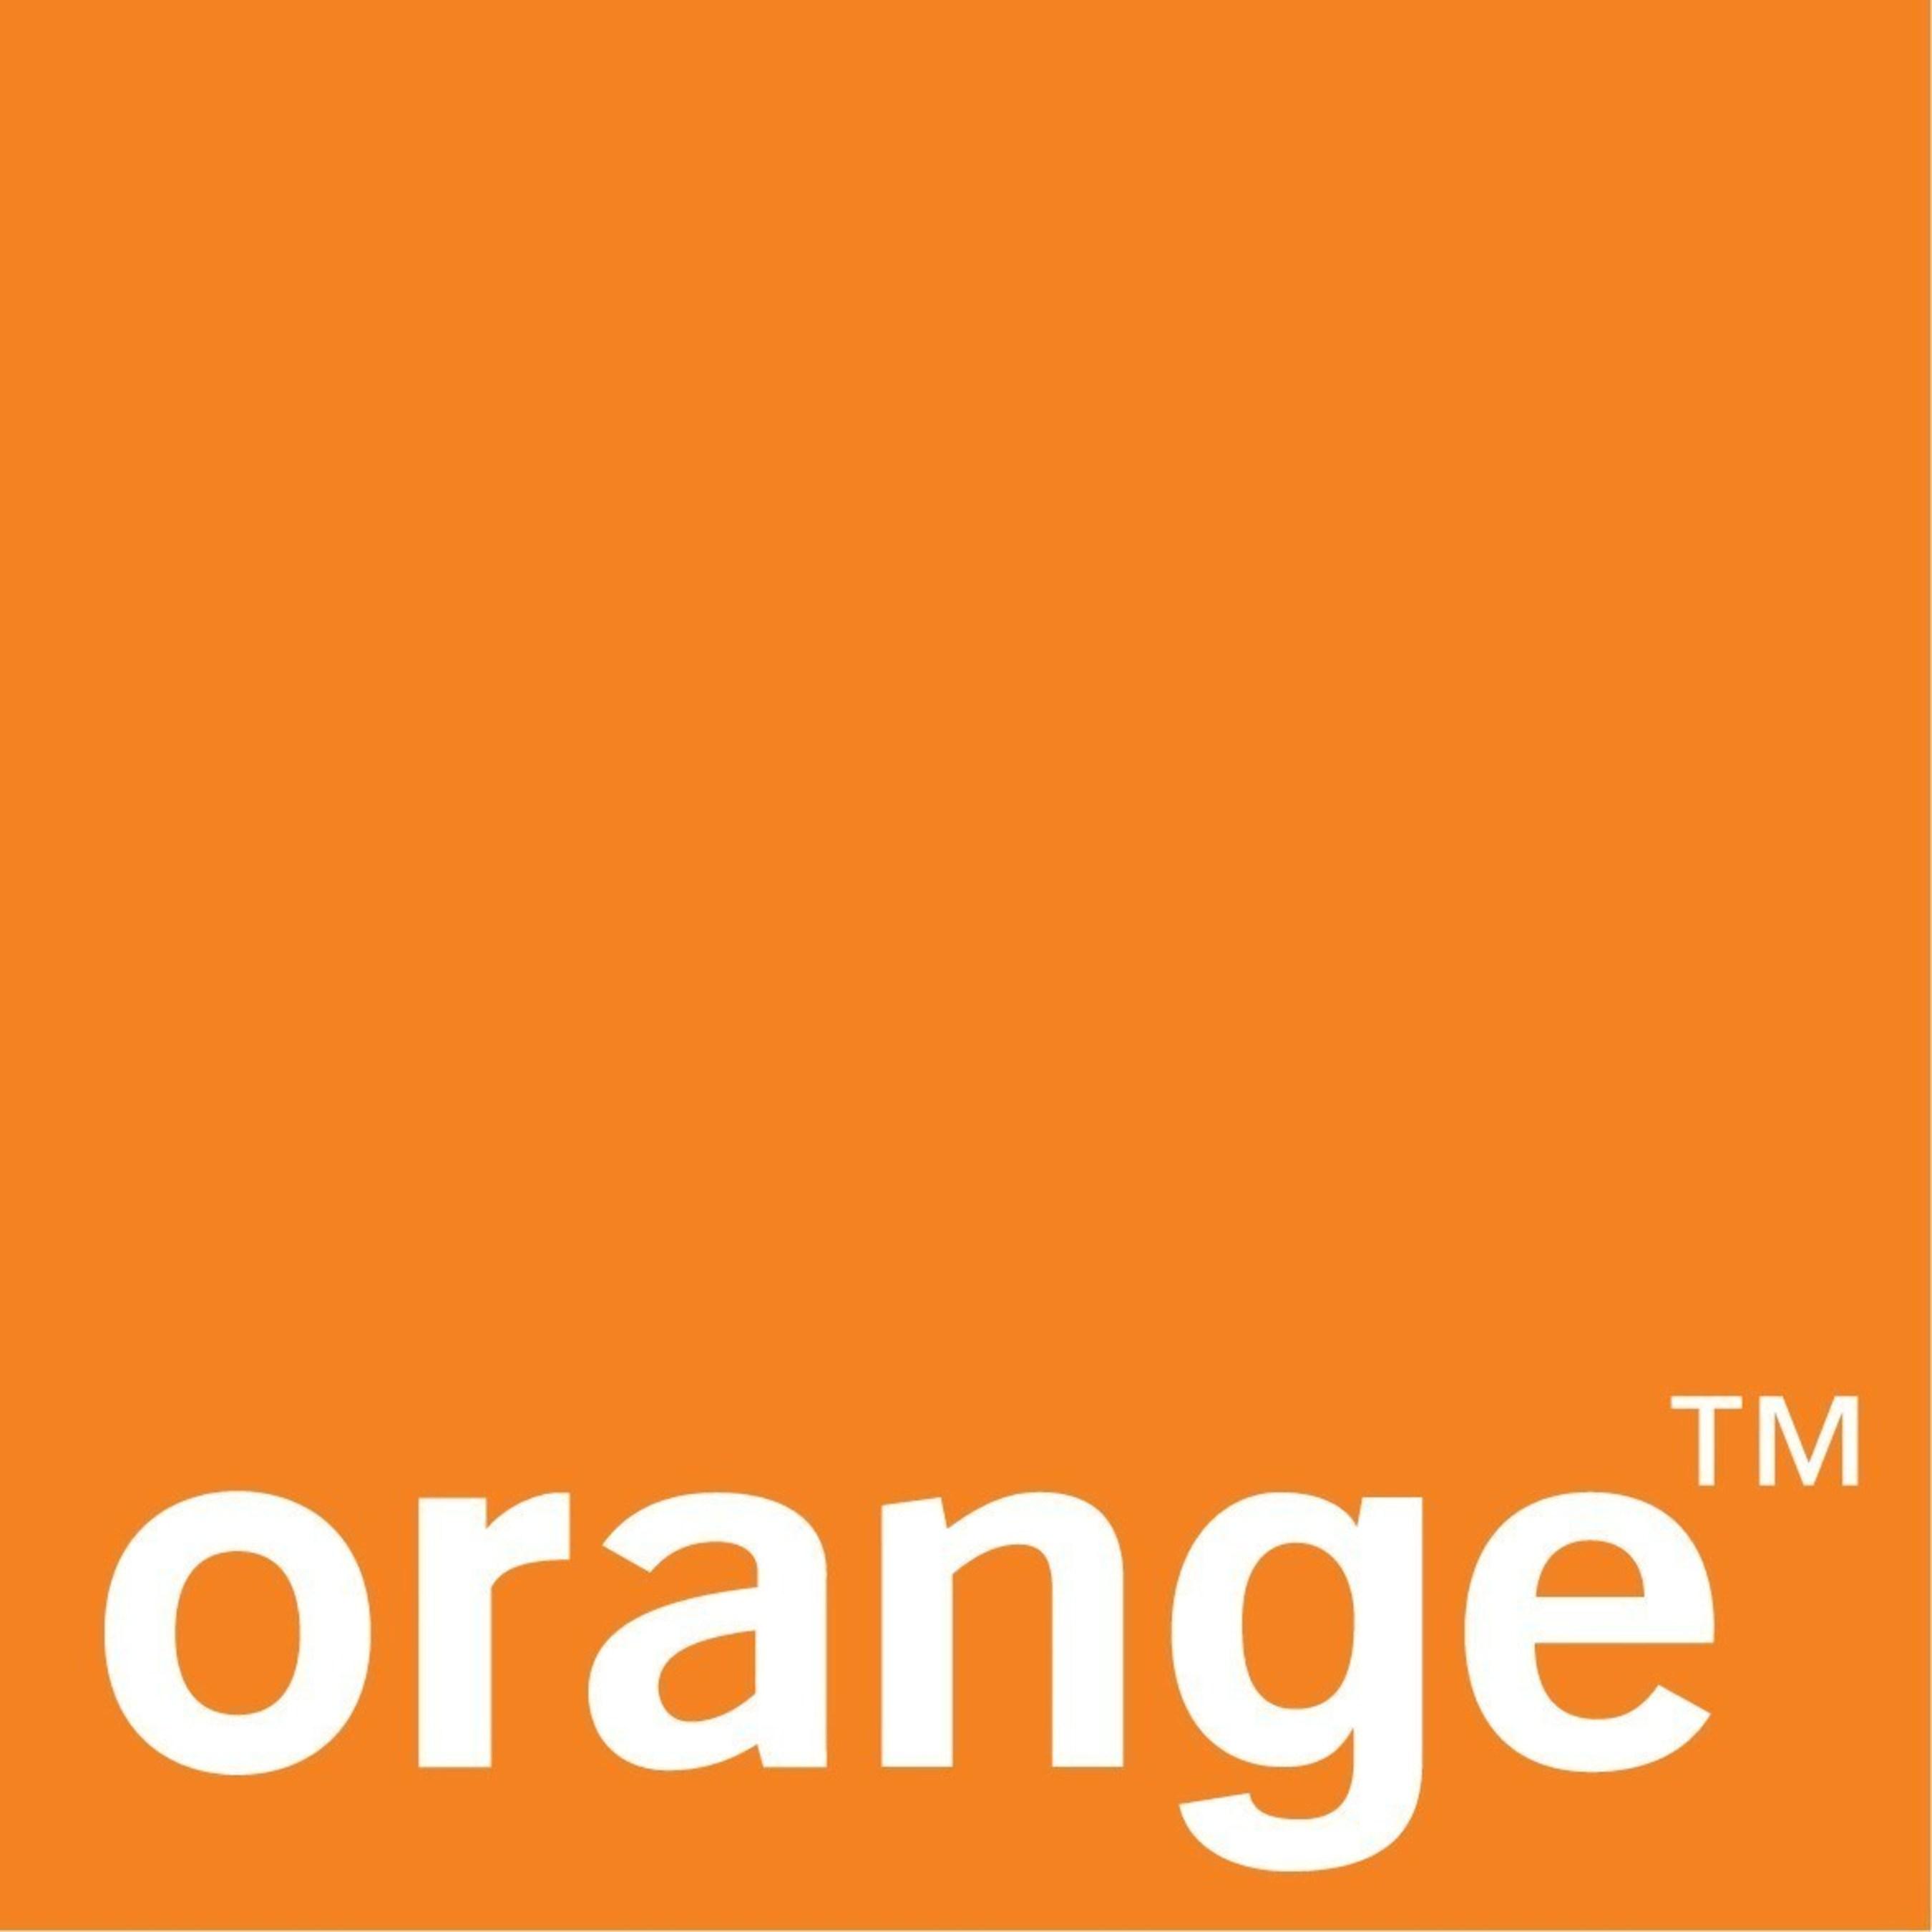 Orange Logo (www.orange.com, www.orange-business.com or www.livetv.orange.com)